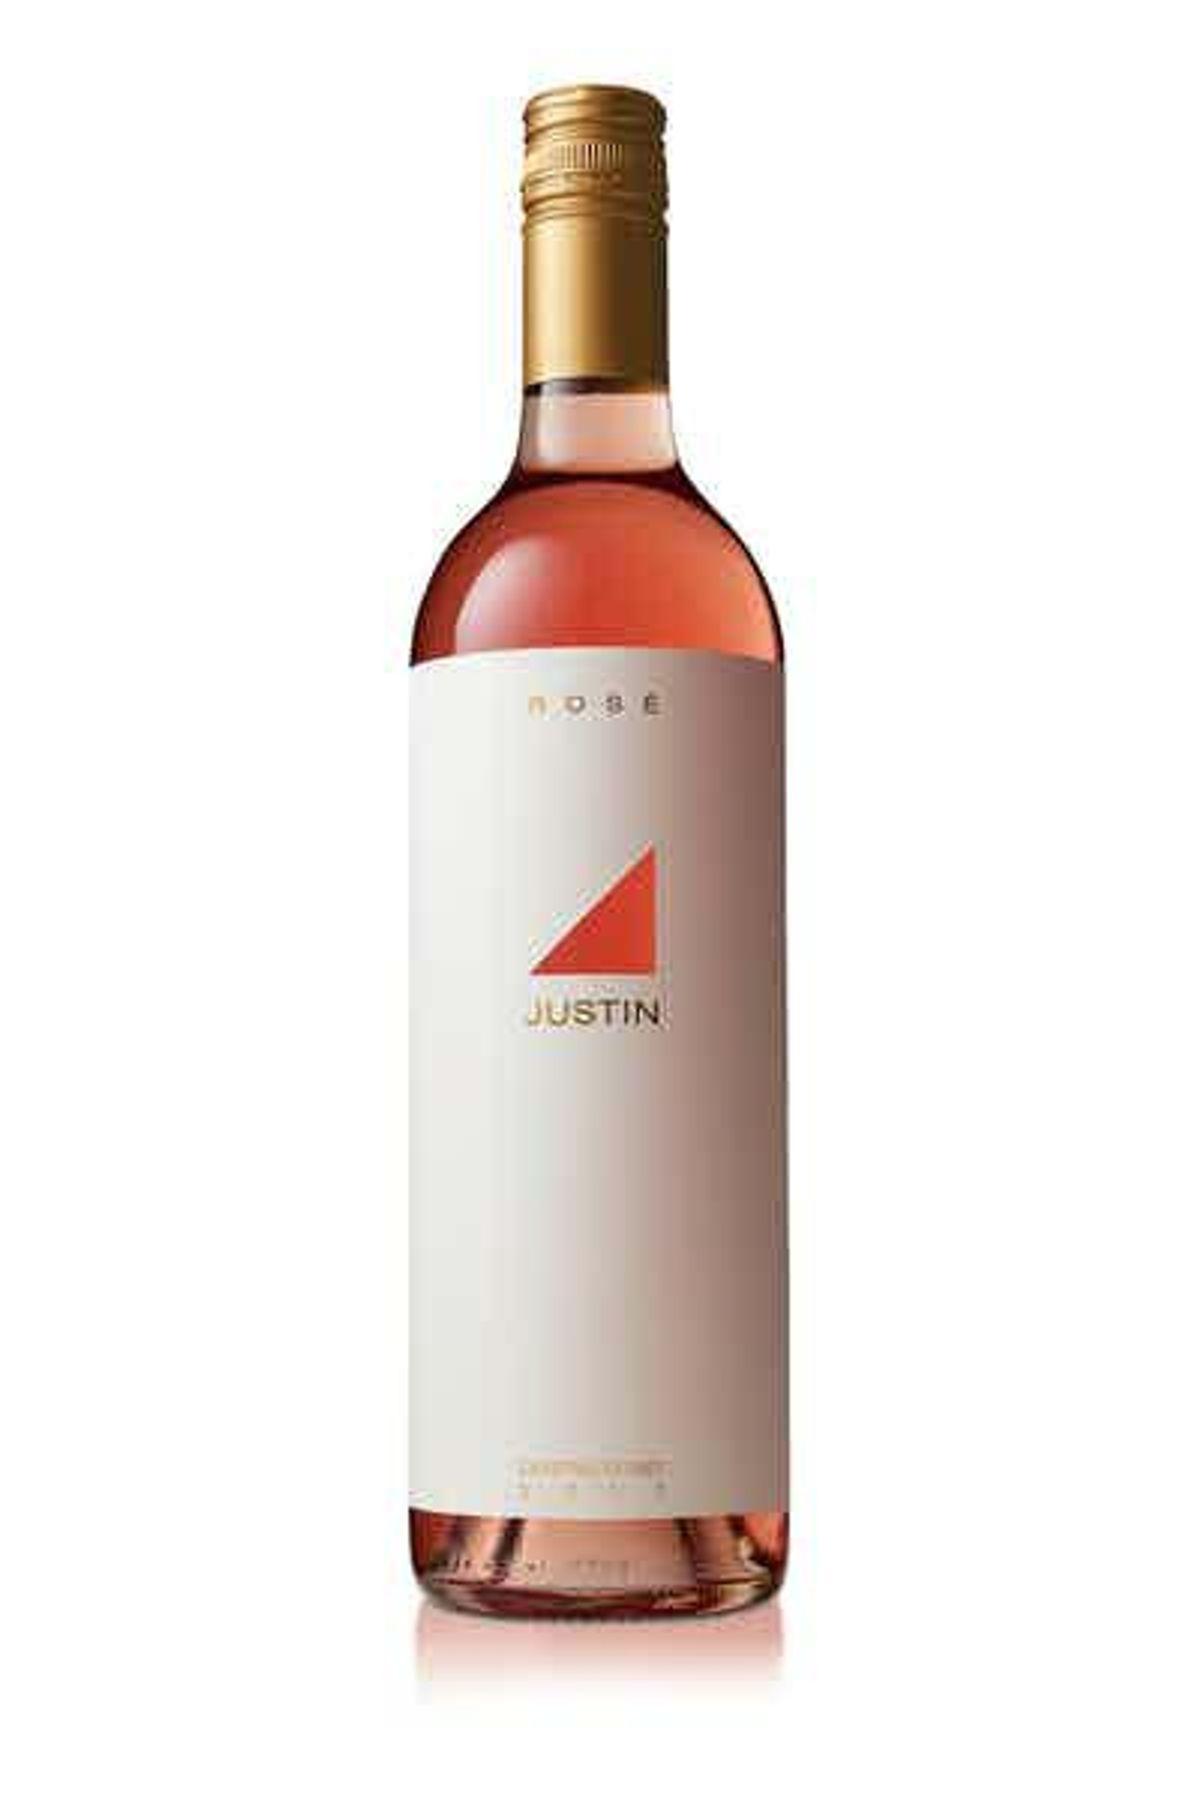 justin rose wine